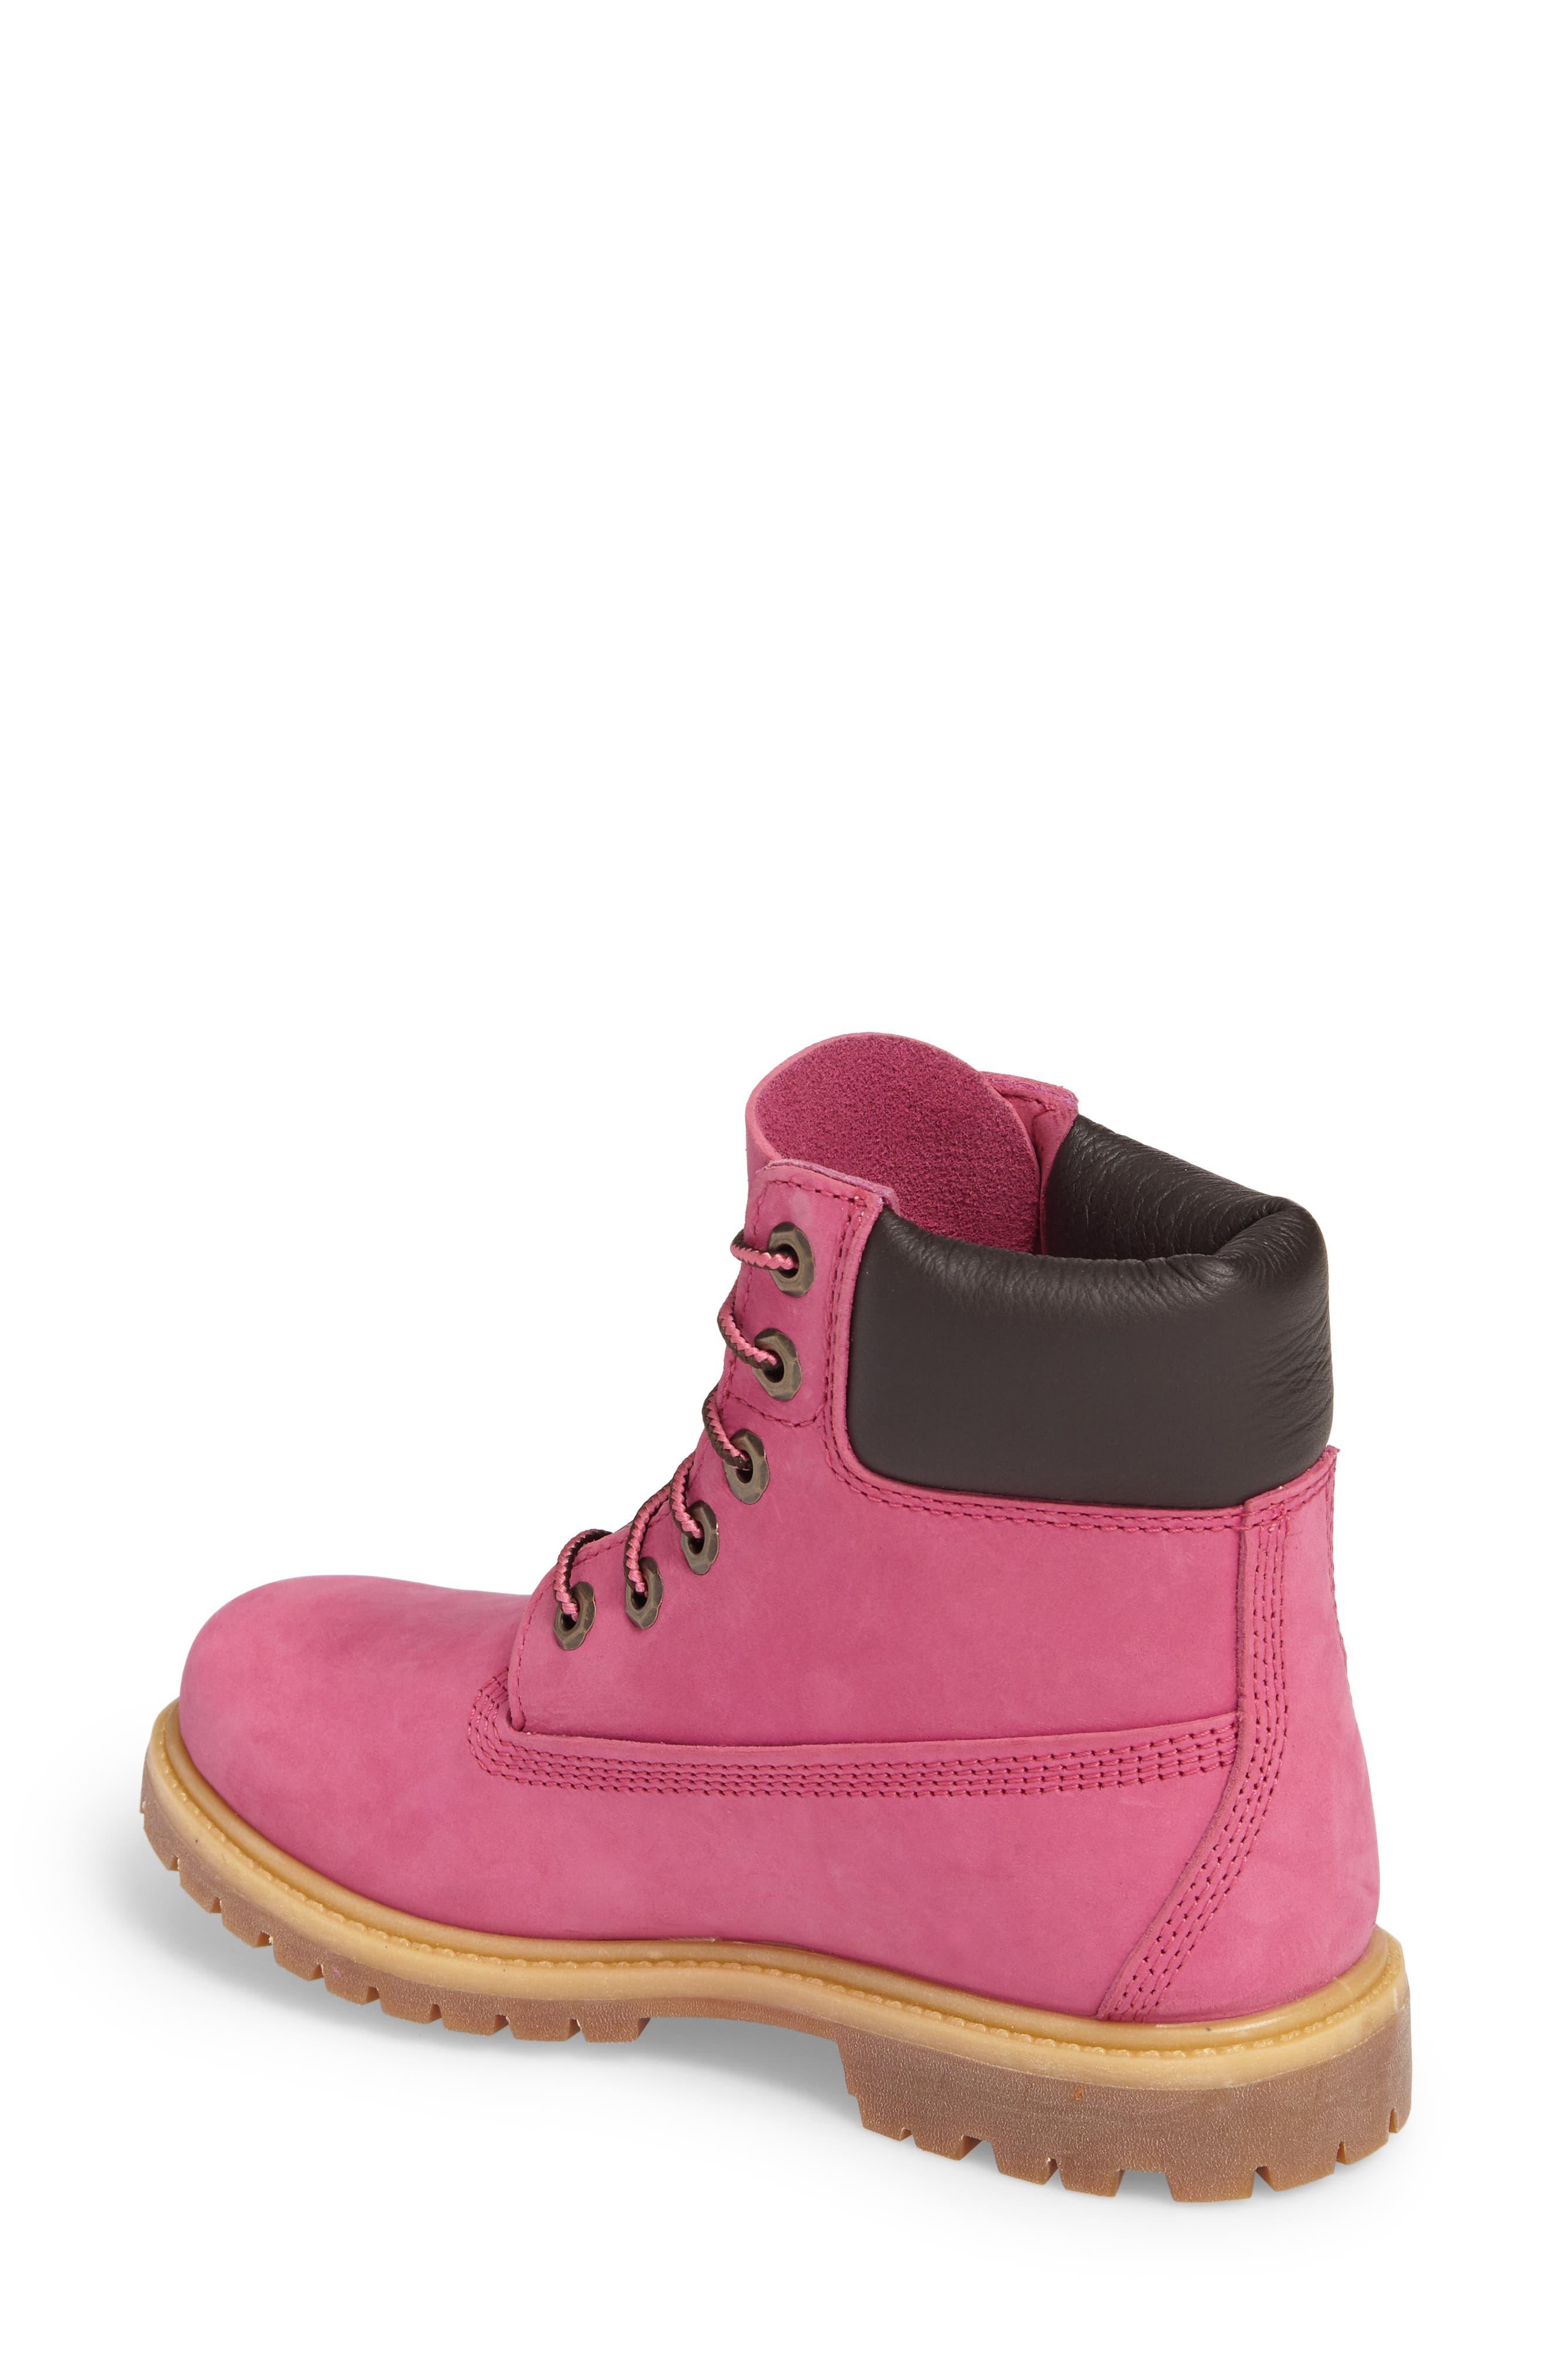 x Susan G. Komen 6-Inch Waterproof Insulated Boot,                             Alternate thumbnail 2, color,                             Bright Pink Nubuck